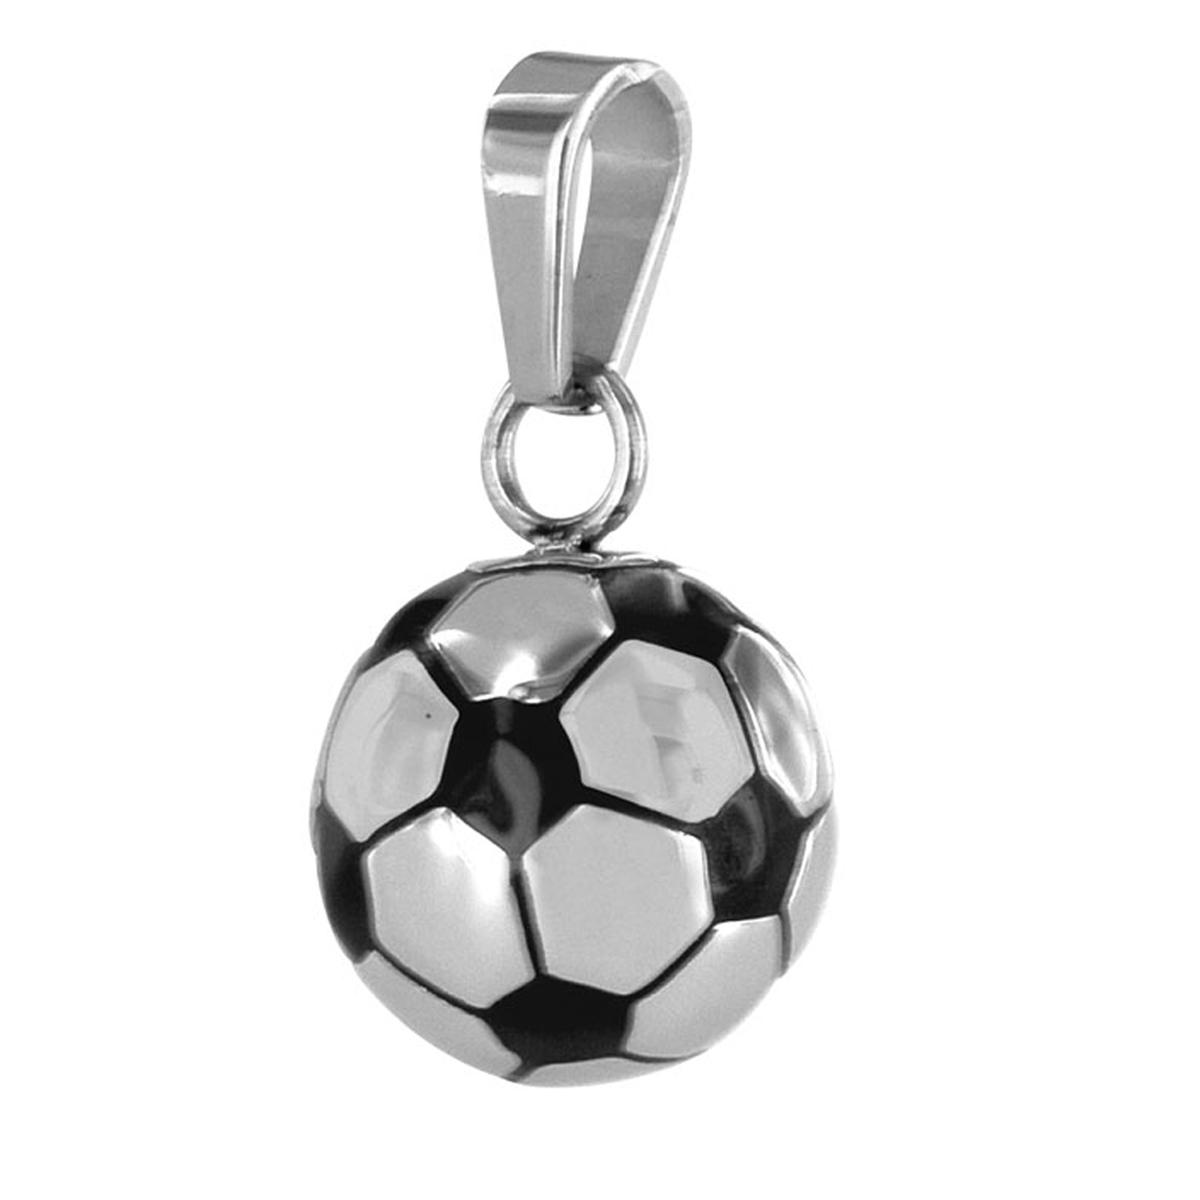 Pendentif acier \'Football\' noir chrome - 15 mm - [R5133]